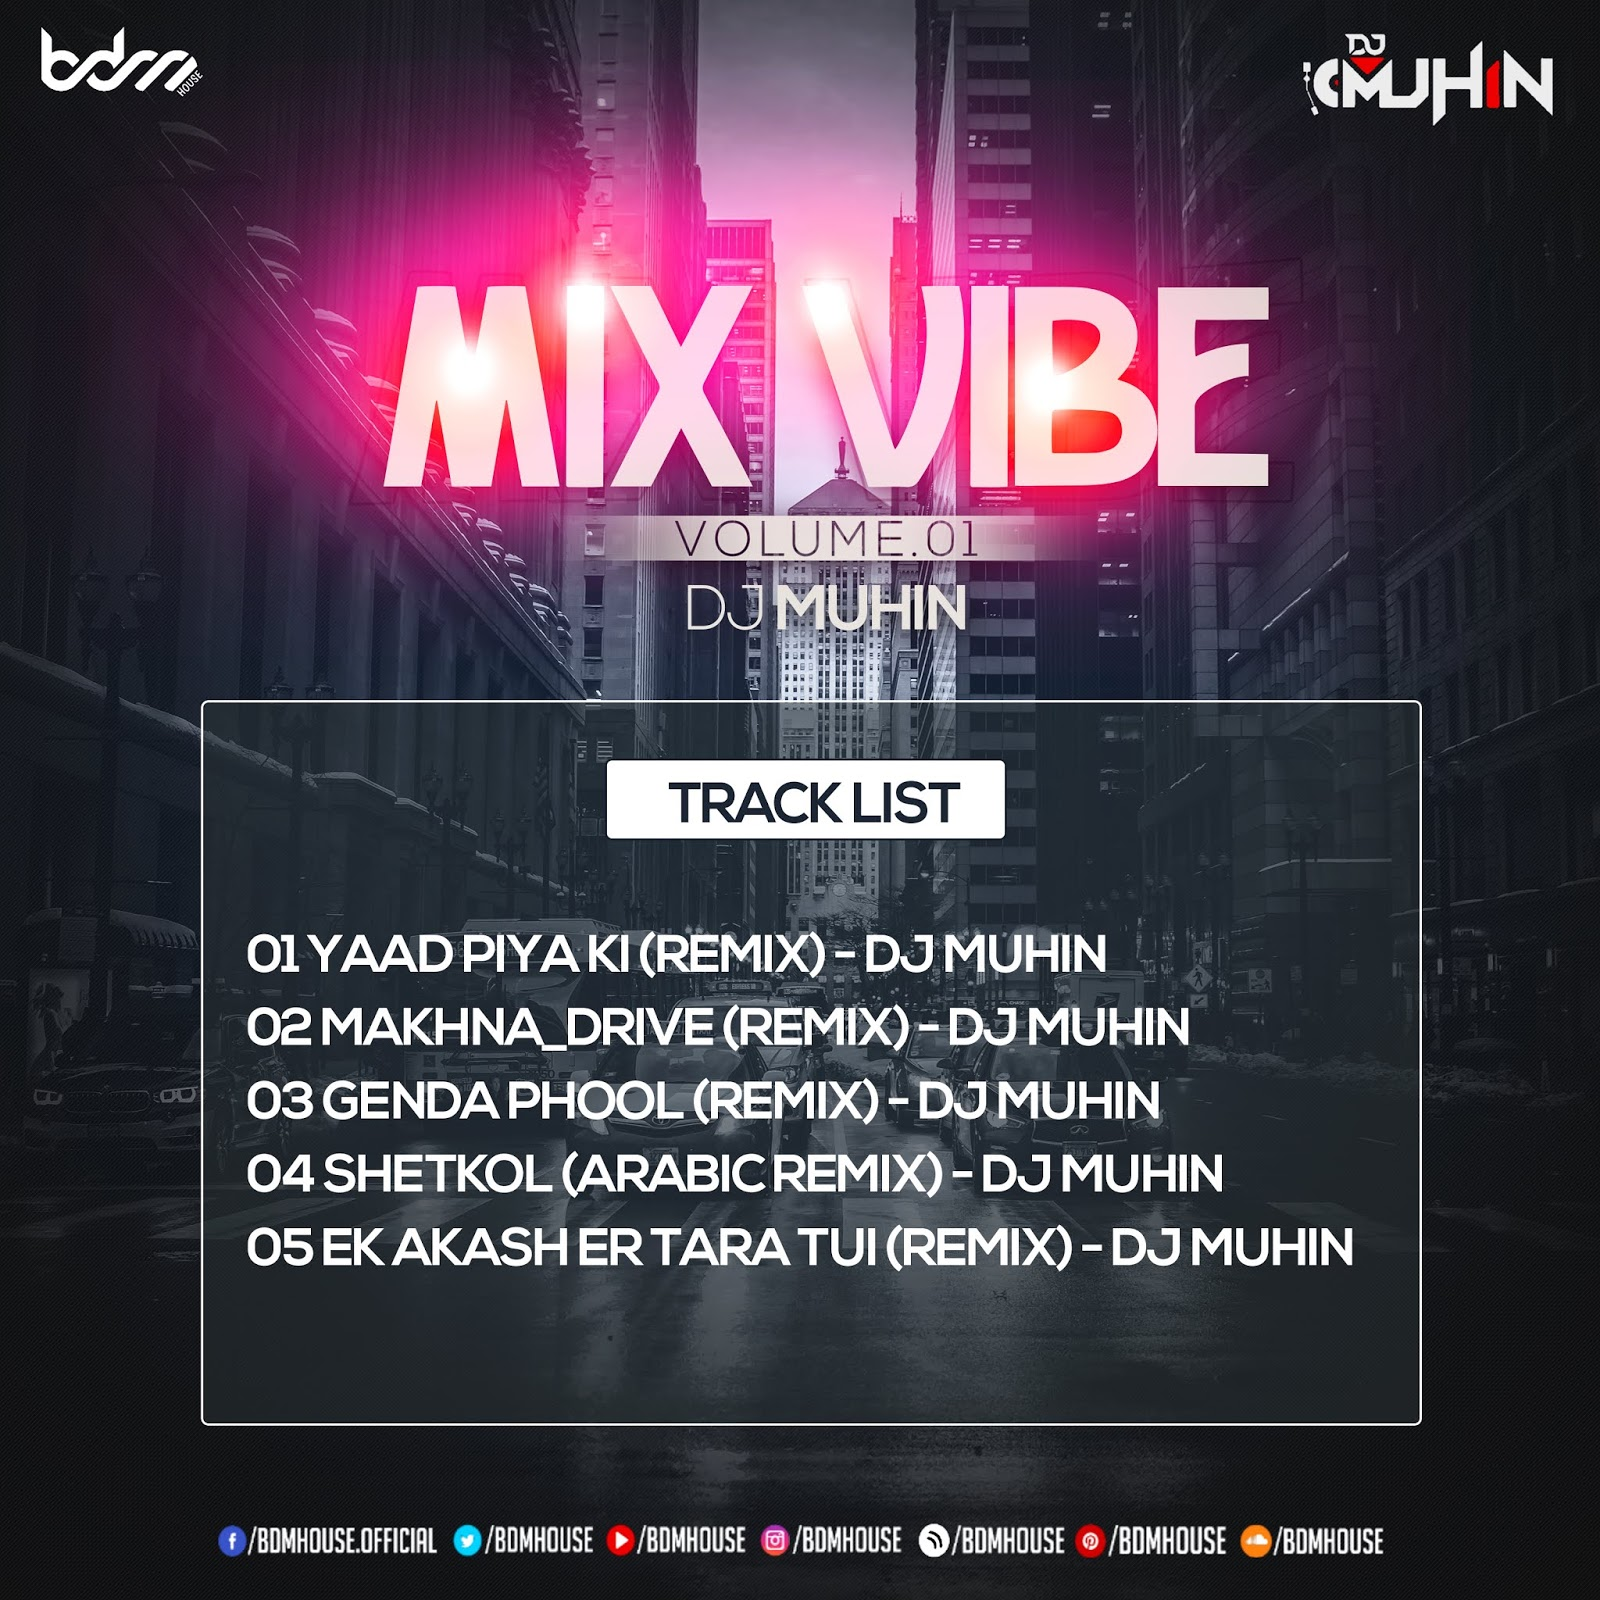 MIX VIBE - VOL.01 - DJ MUHIN